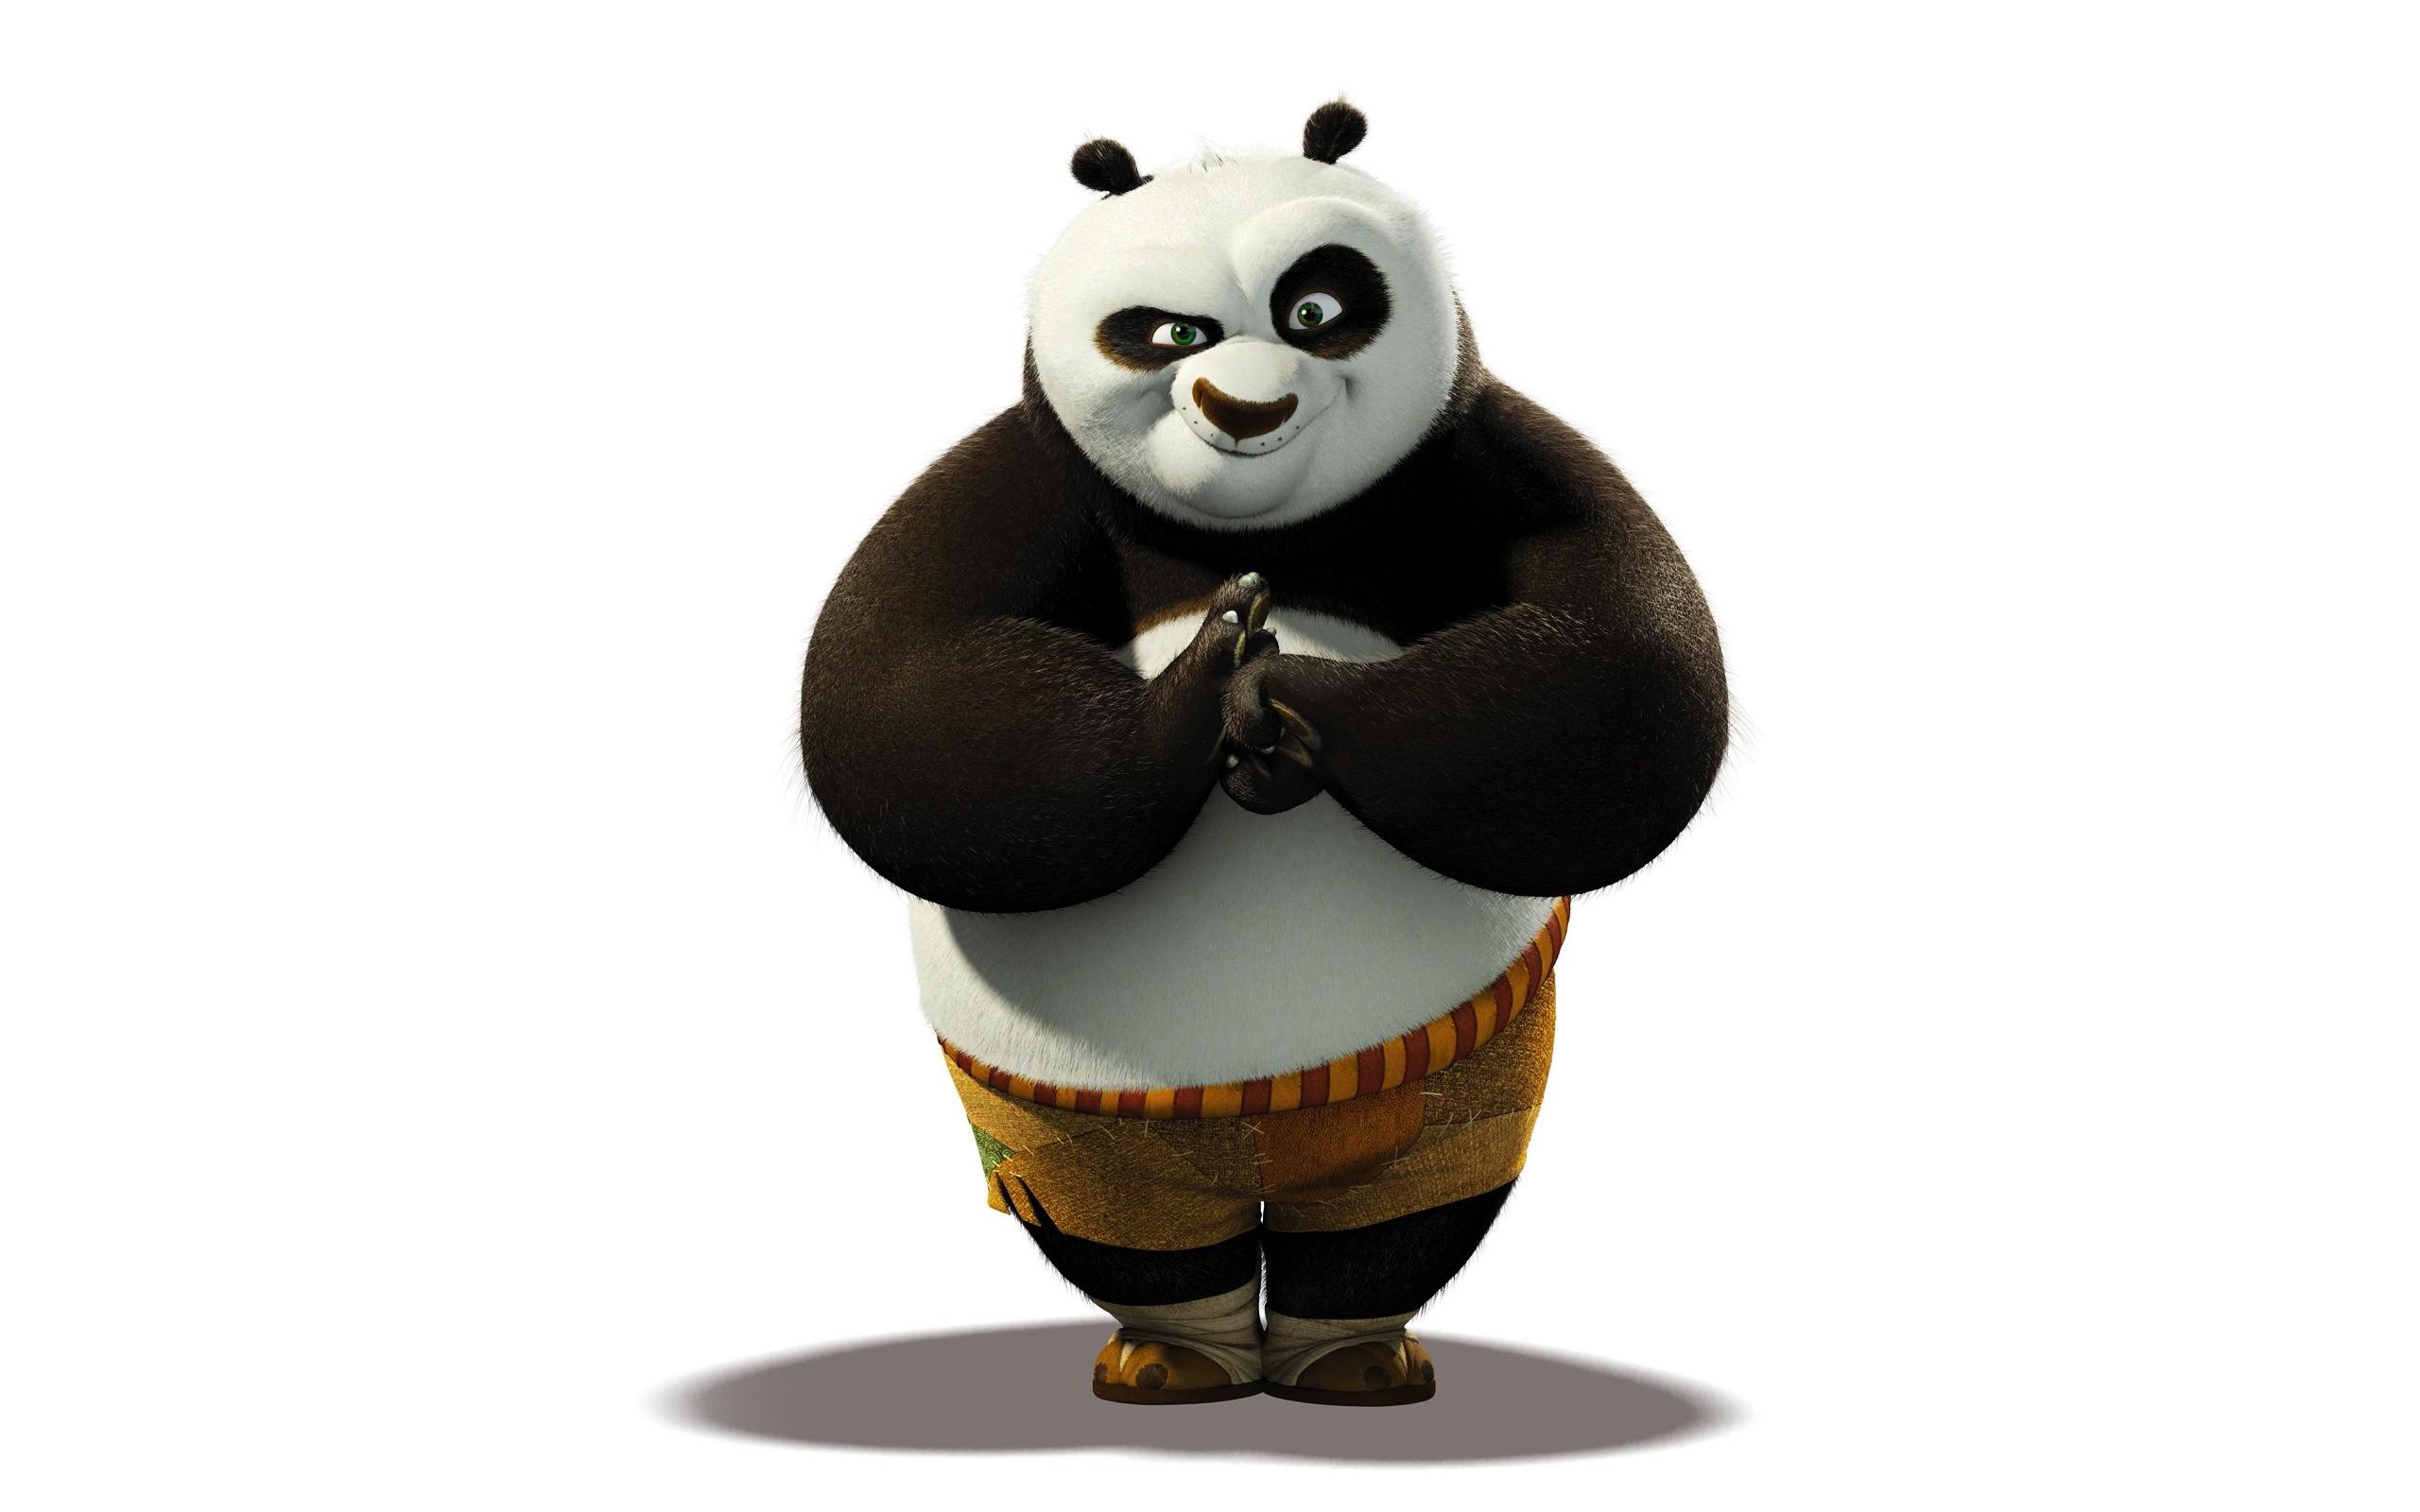 Kung Fu Panda 2 Gorilla